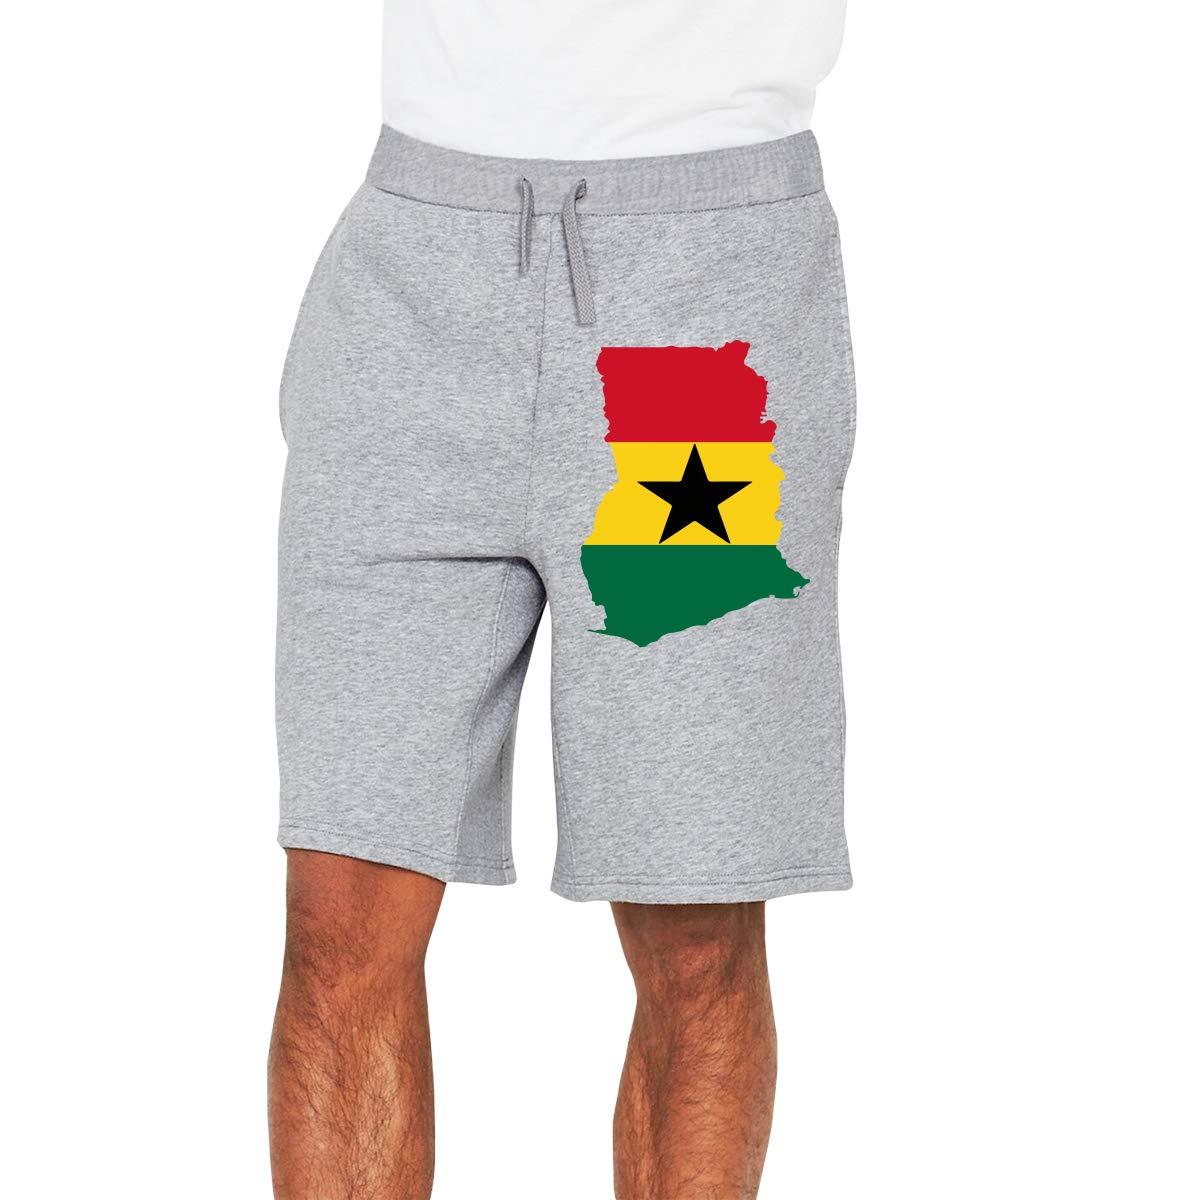 YDXC2FY Men Board Short with Elastic Waist Drawstring Summer Shorts Ghana Flag 1 Patterned Gym Jogging Shorts